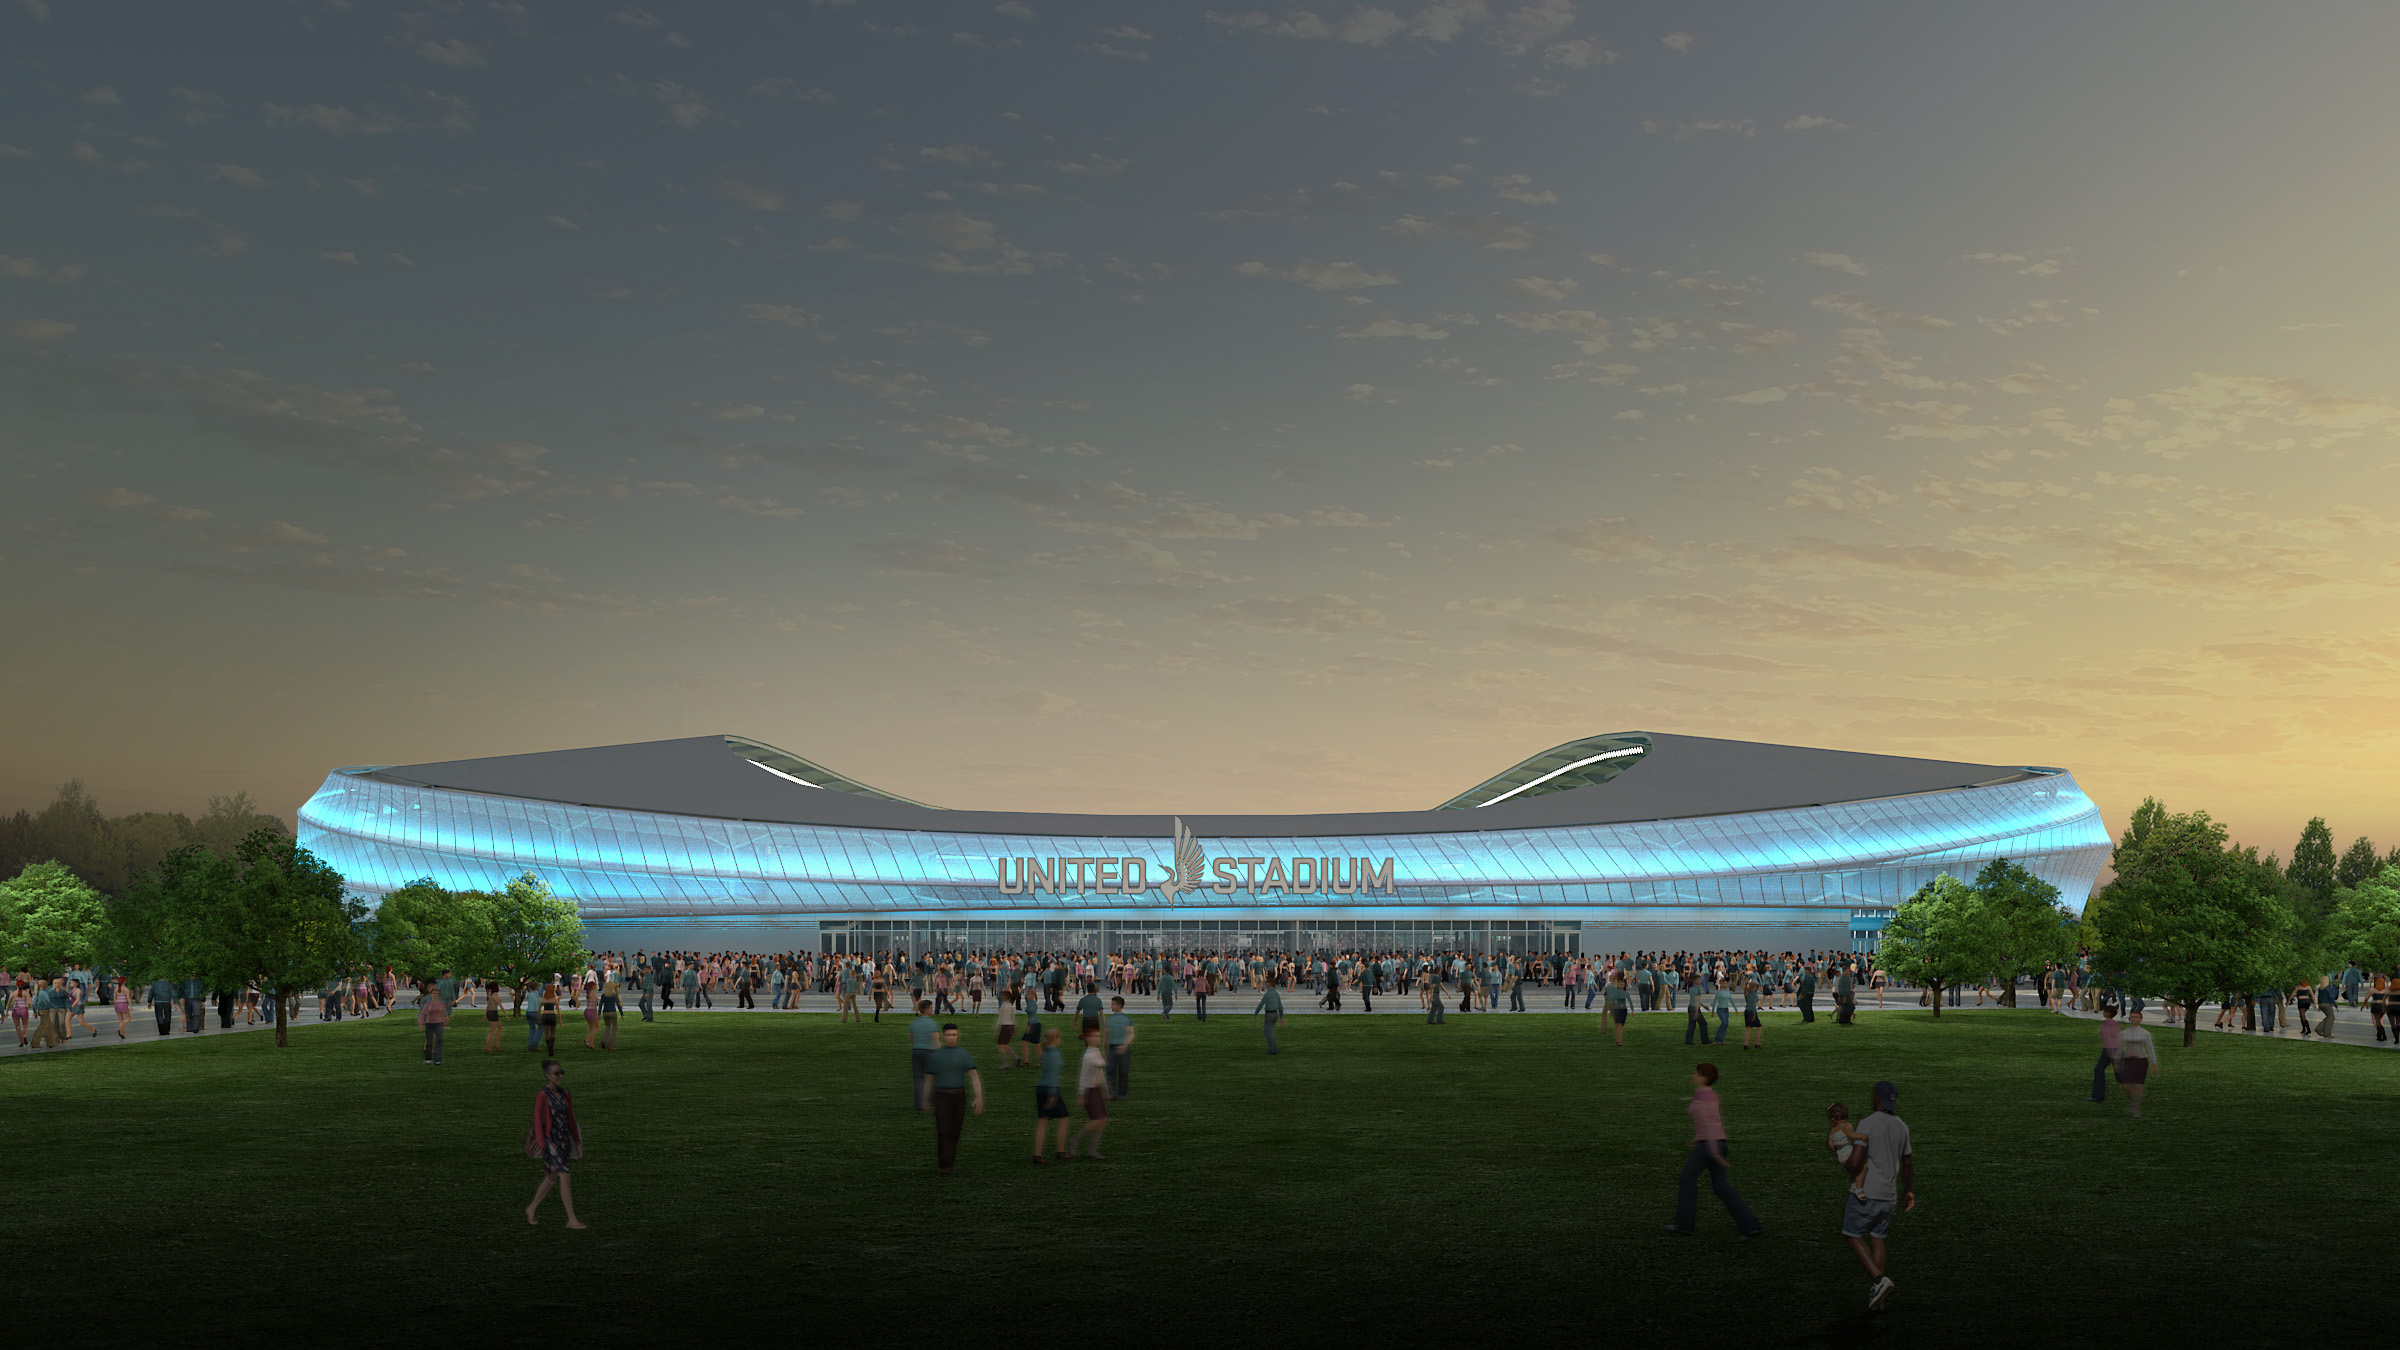 exterior-dusk new stadium image 12-16